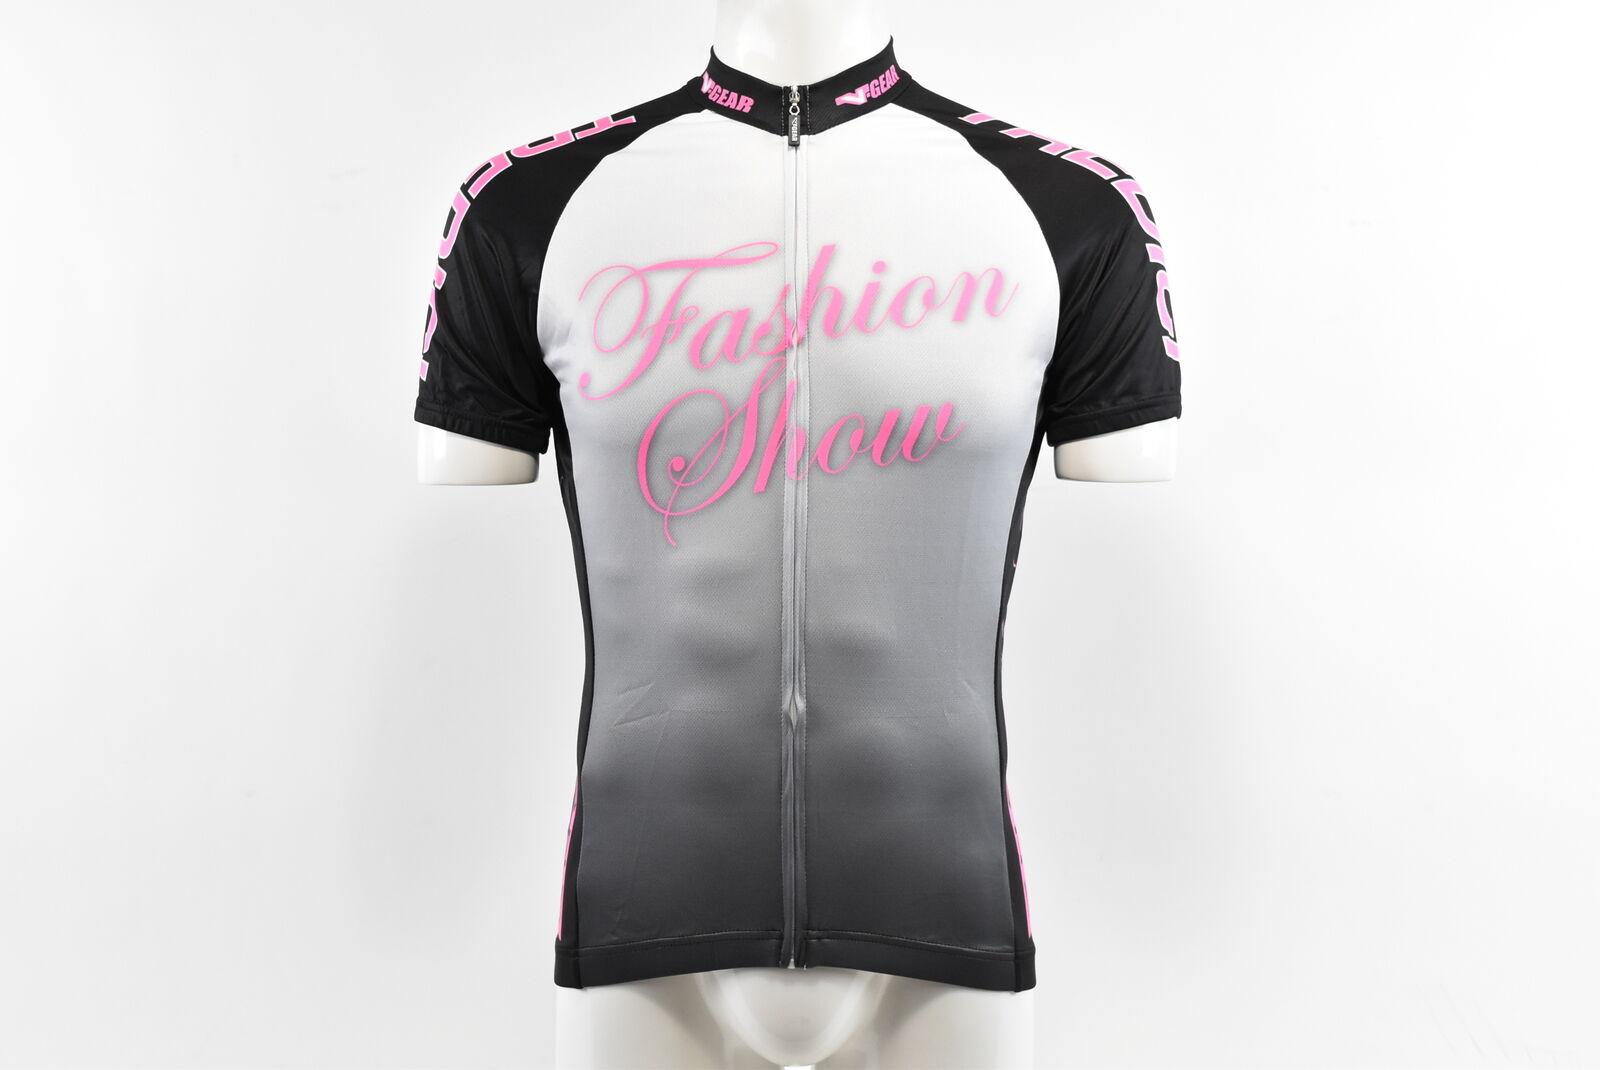 d0d1db6429ed Verge V-Gear Fashion Show Women s S S Cycling Jersey